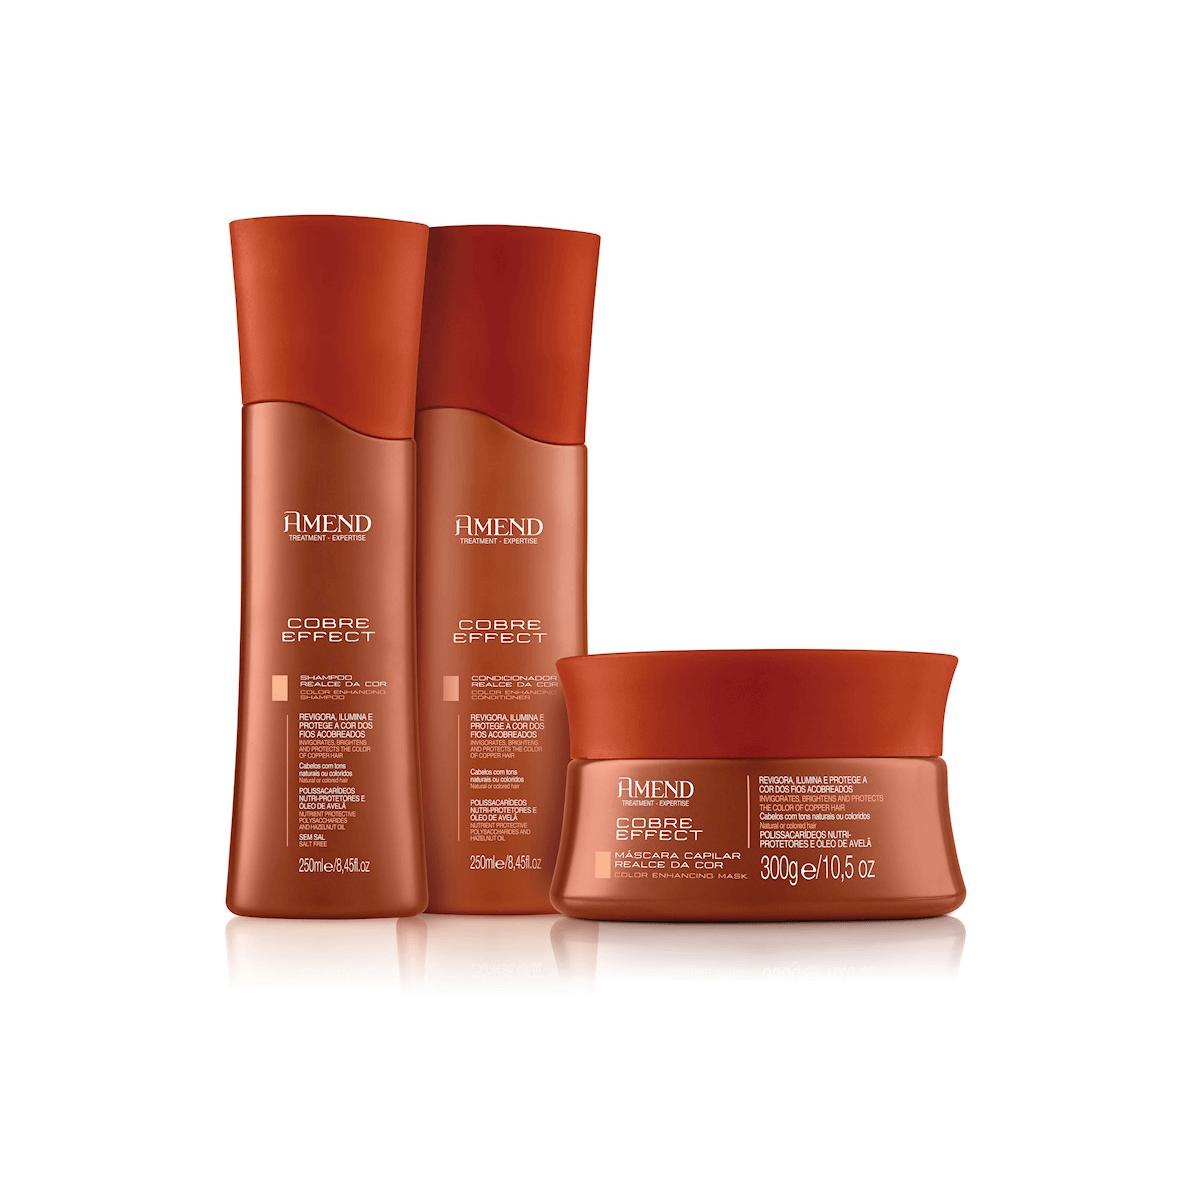 Kit Realce da Cor Cobre Effect Amend - Shampoo, Condicionador e Mascara de Tratamento